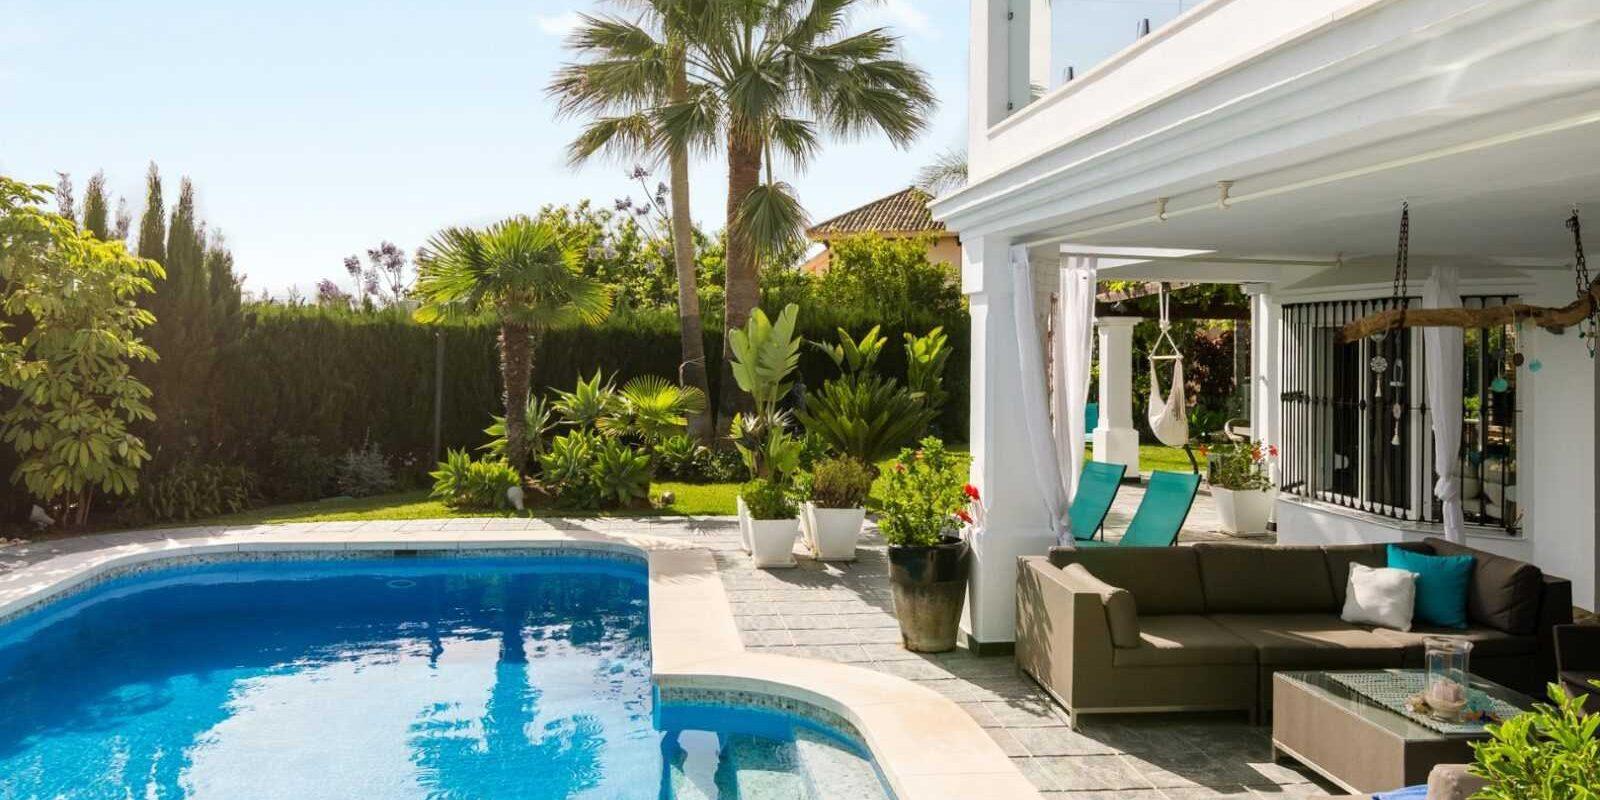 2017.06.01 - Just Rent Marbella - Villa Marlin - (2 of 6) (Large)